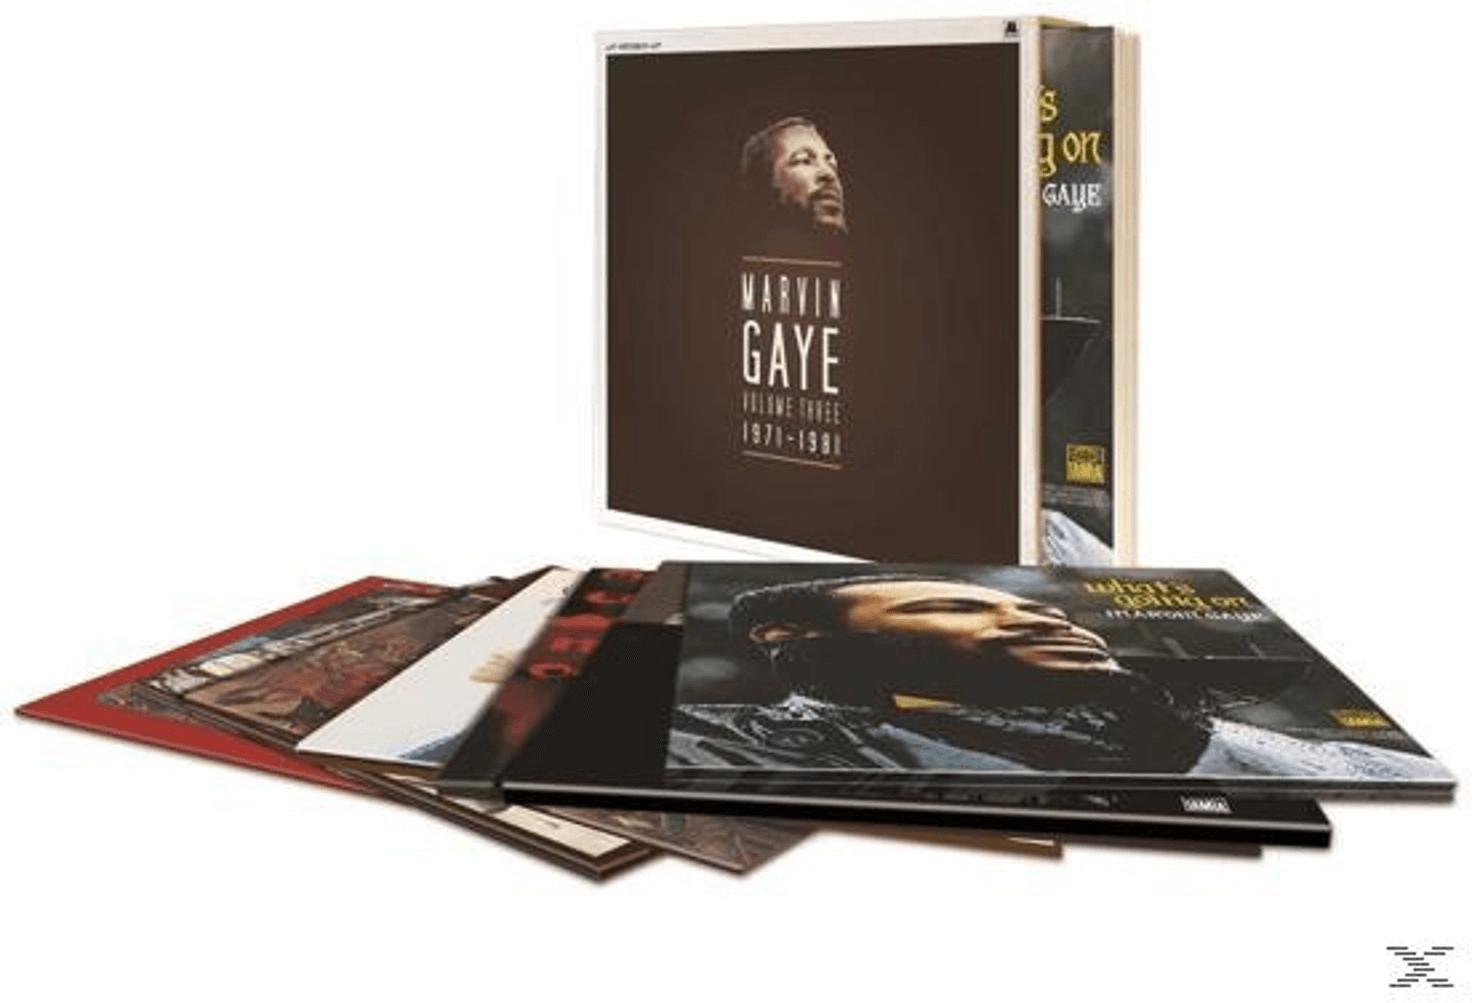 Marvin Gaye - Marvin Gaye Vol.3:1971-1981 (Ltd....